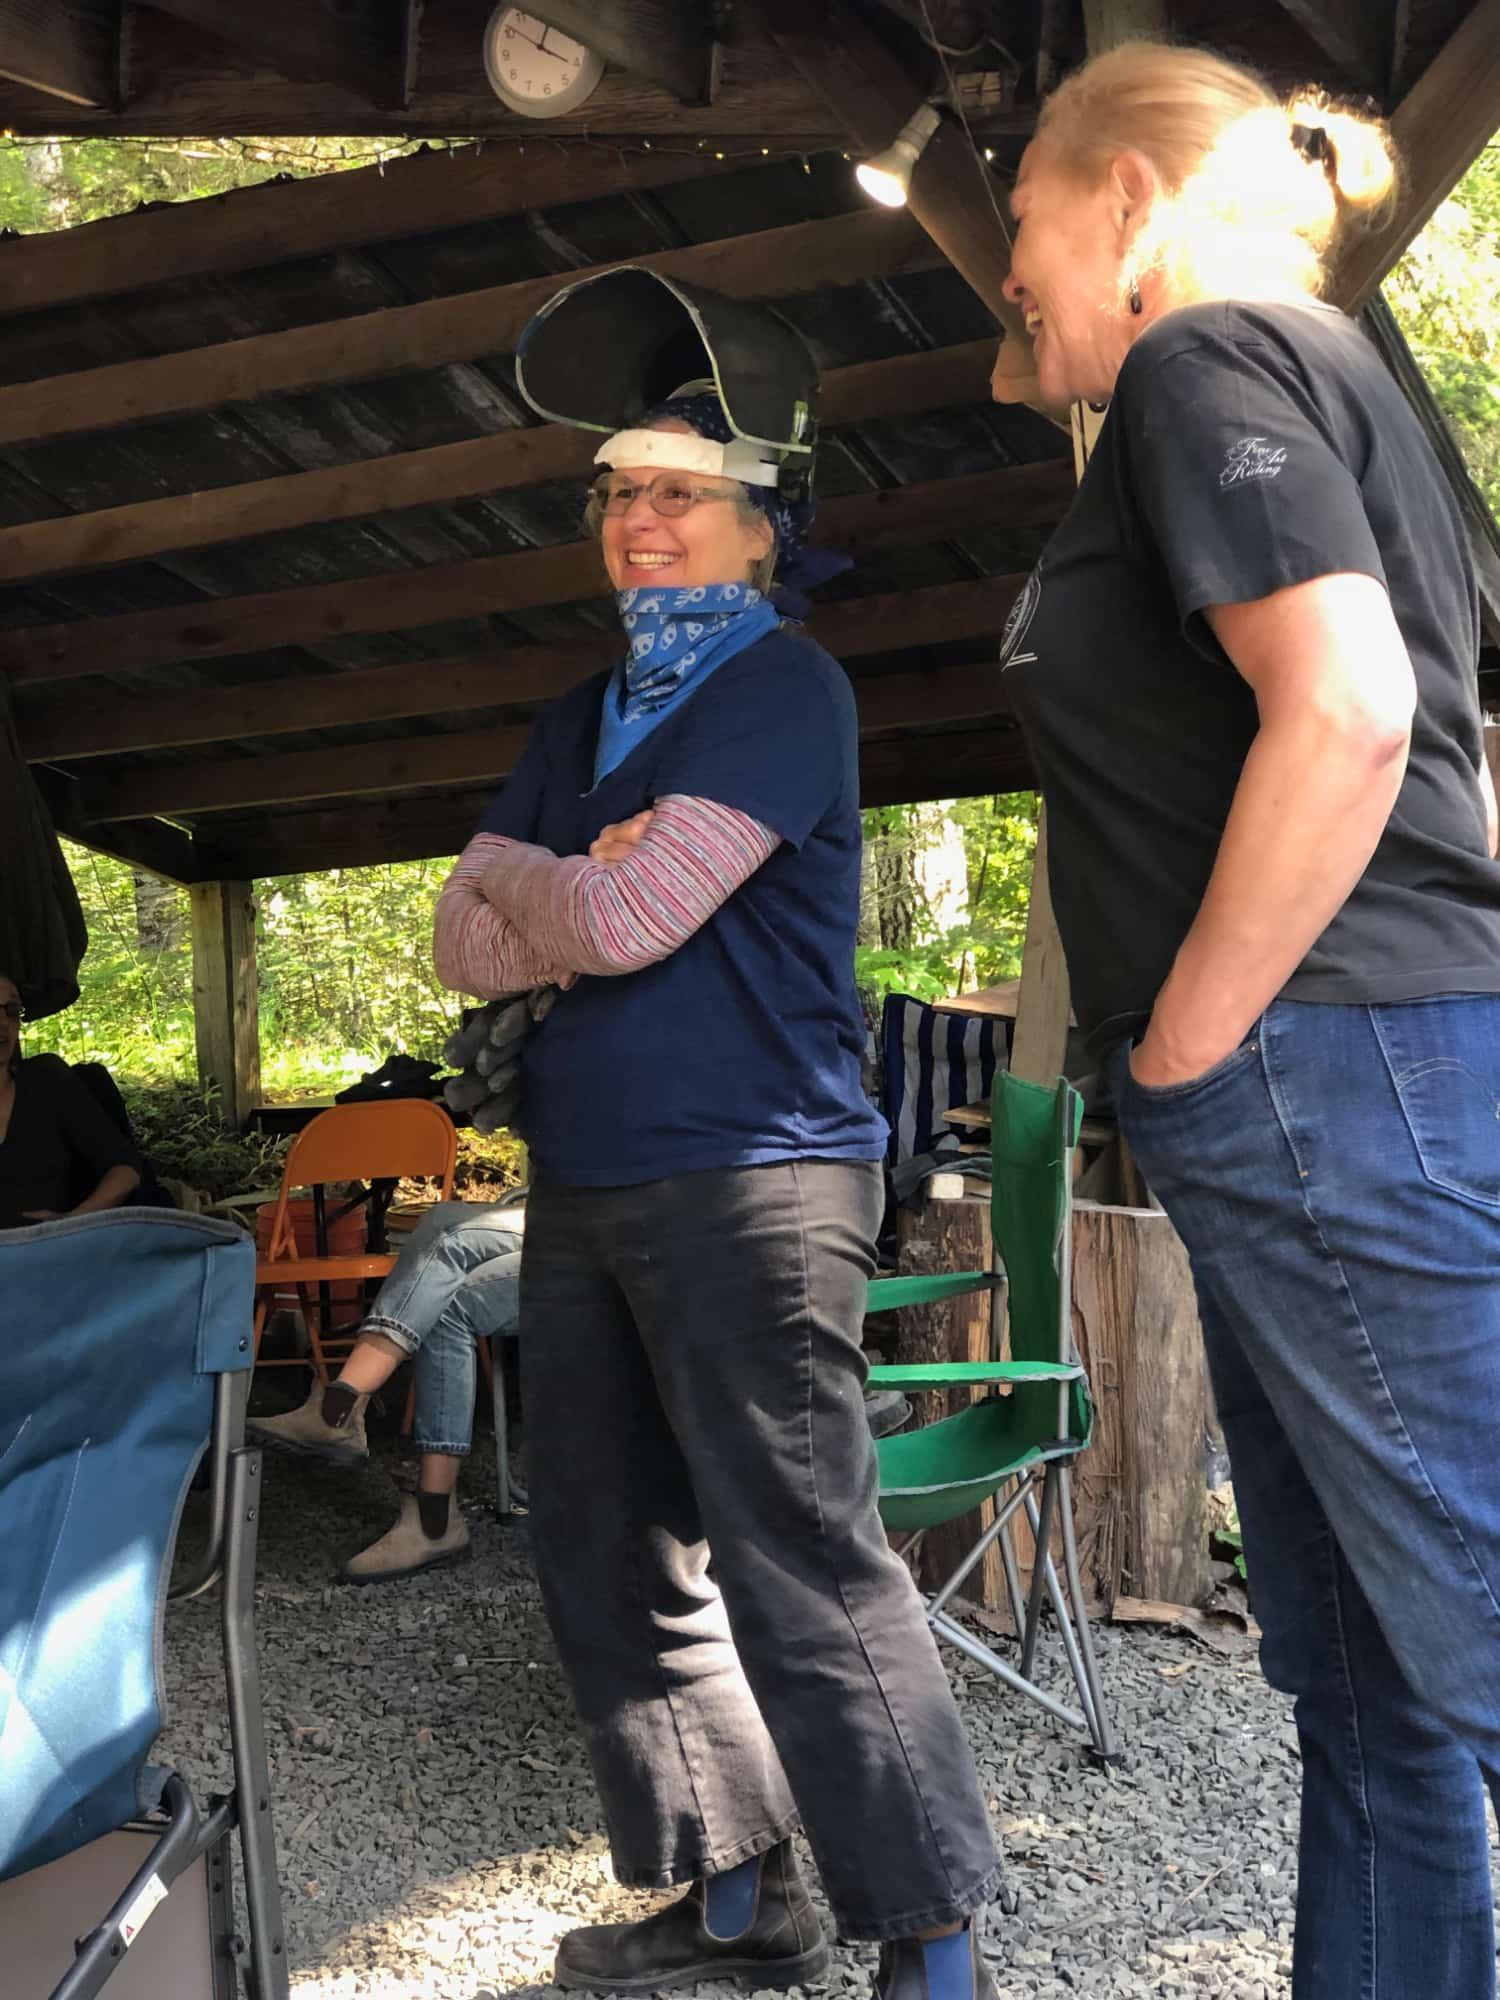 Firing While Female East Creek Anagama 2019 @lilithrockett and Christie Burris.jpg